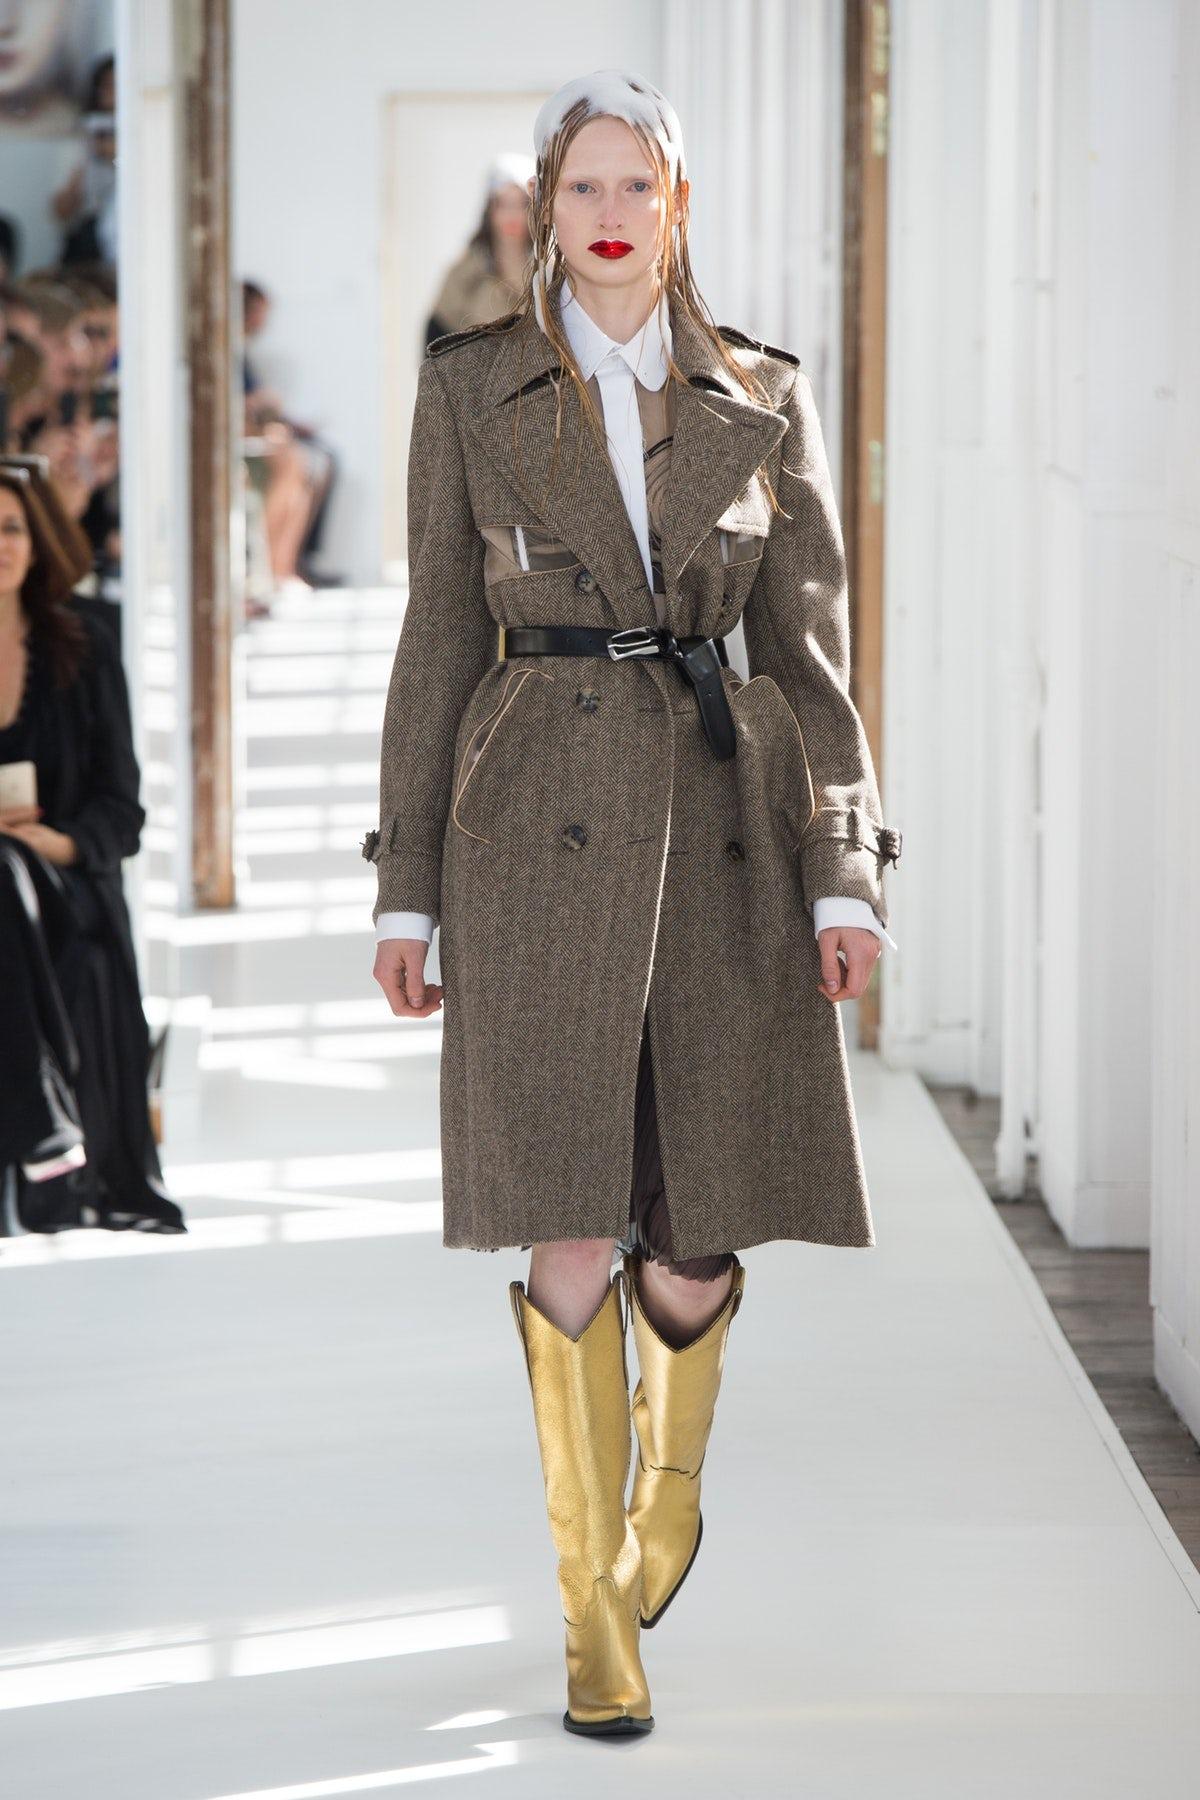 Maison Margiela Haute Couture Autumn 2018   Source: InDigital.tv